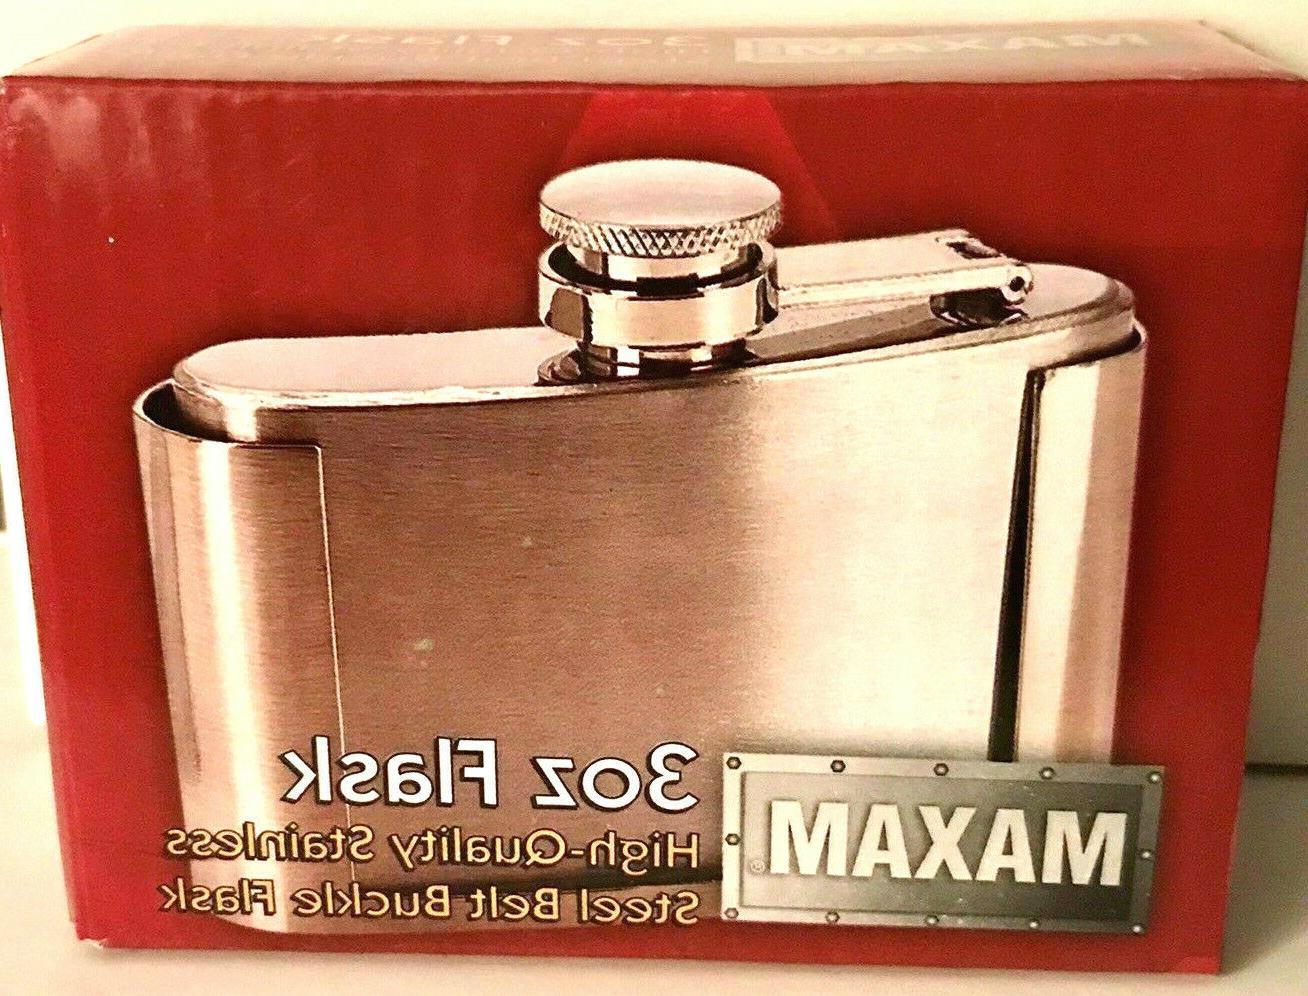 Maxam 3oz Belt Buckle w/Stainless Steel Construction -